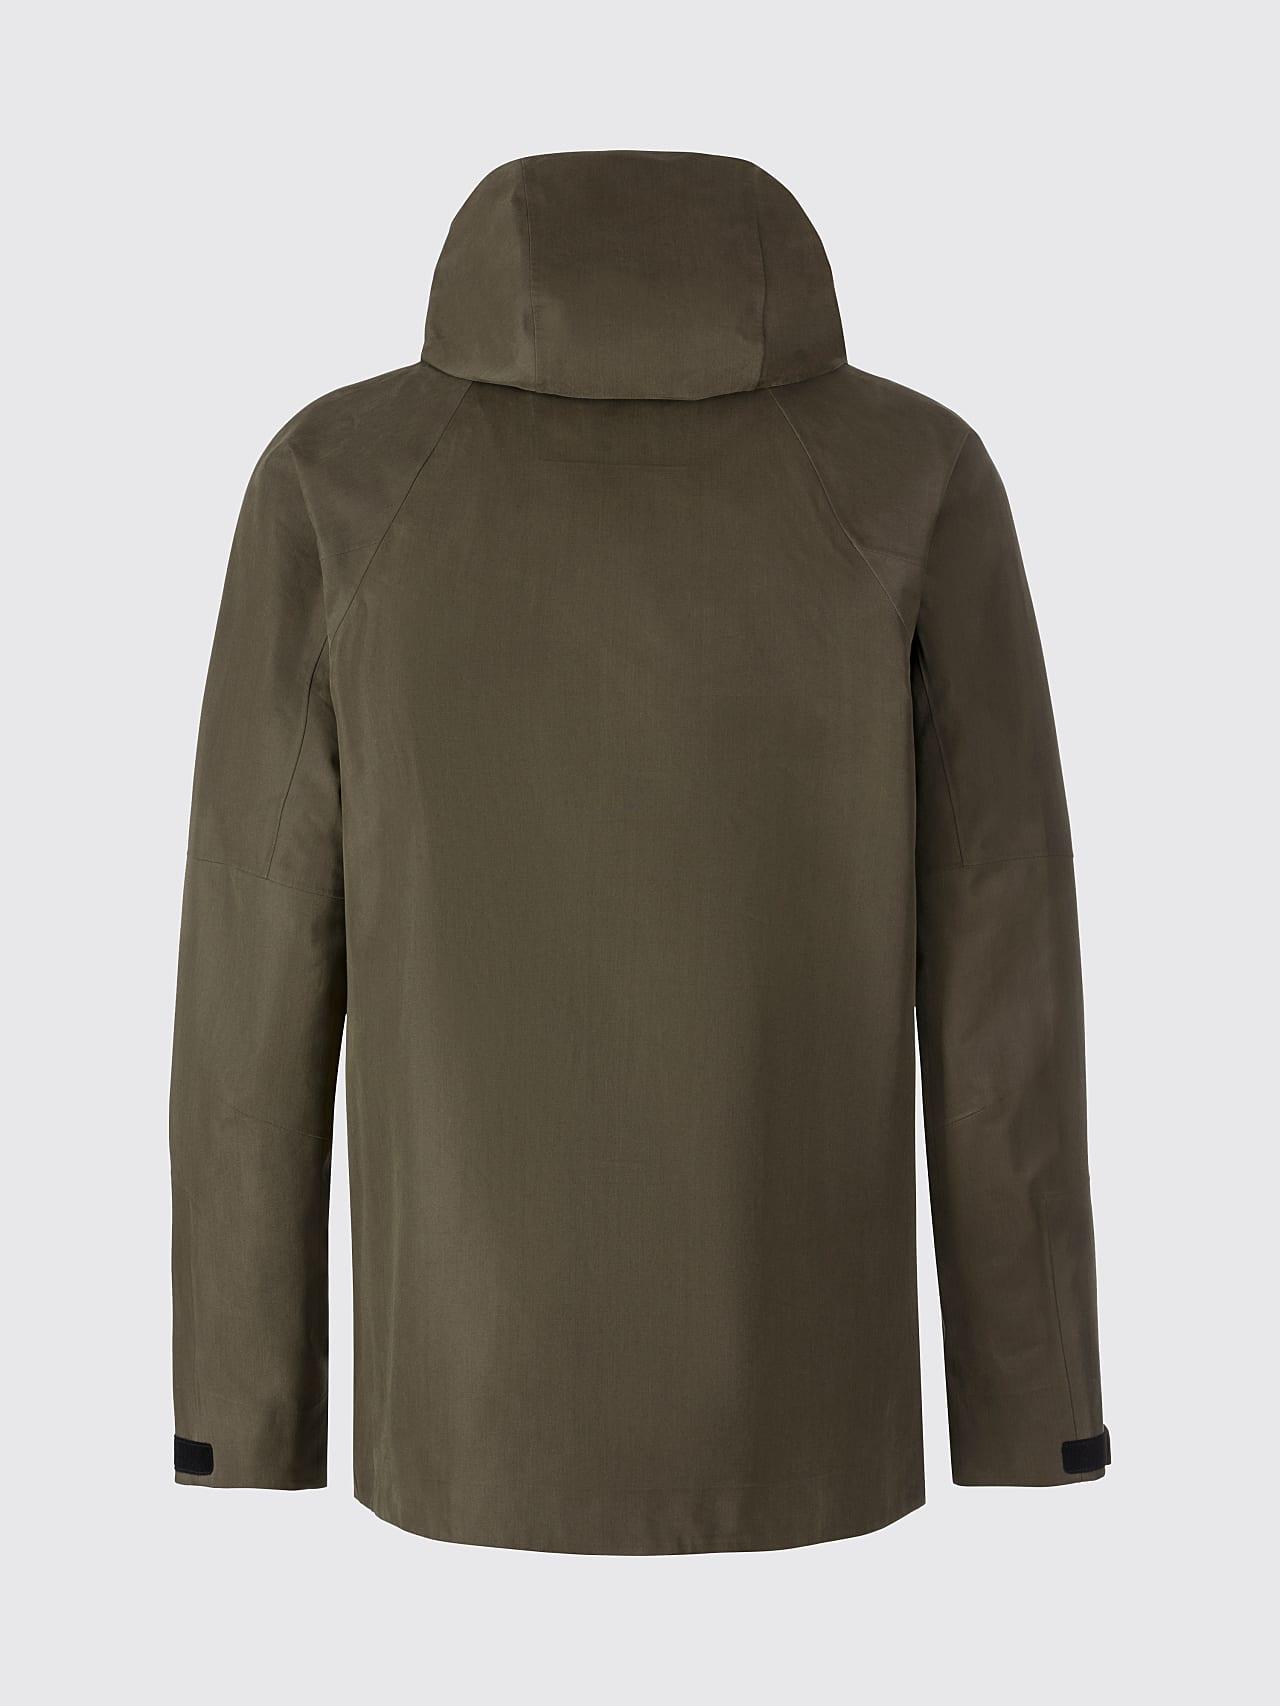 OKOVO V3.Y5.01 Packable Waterproof Jacket olive Left Alpha Tauri